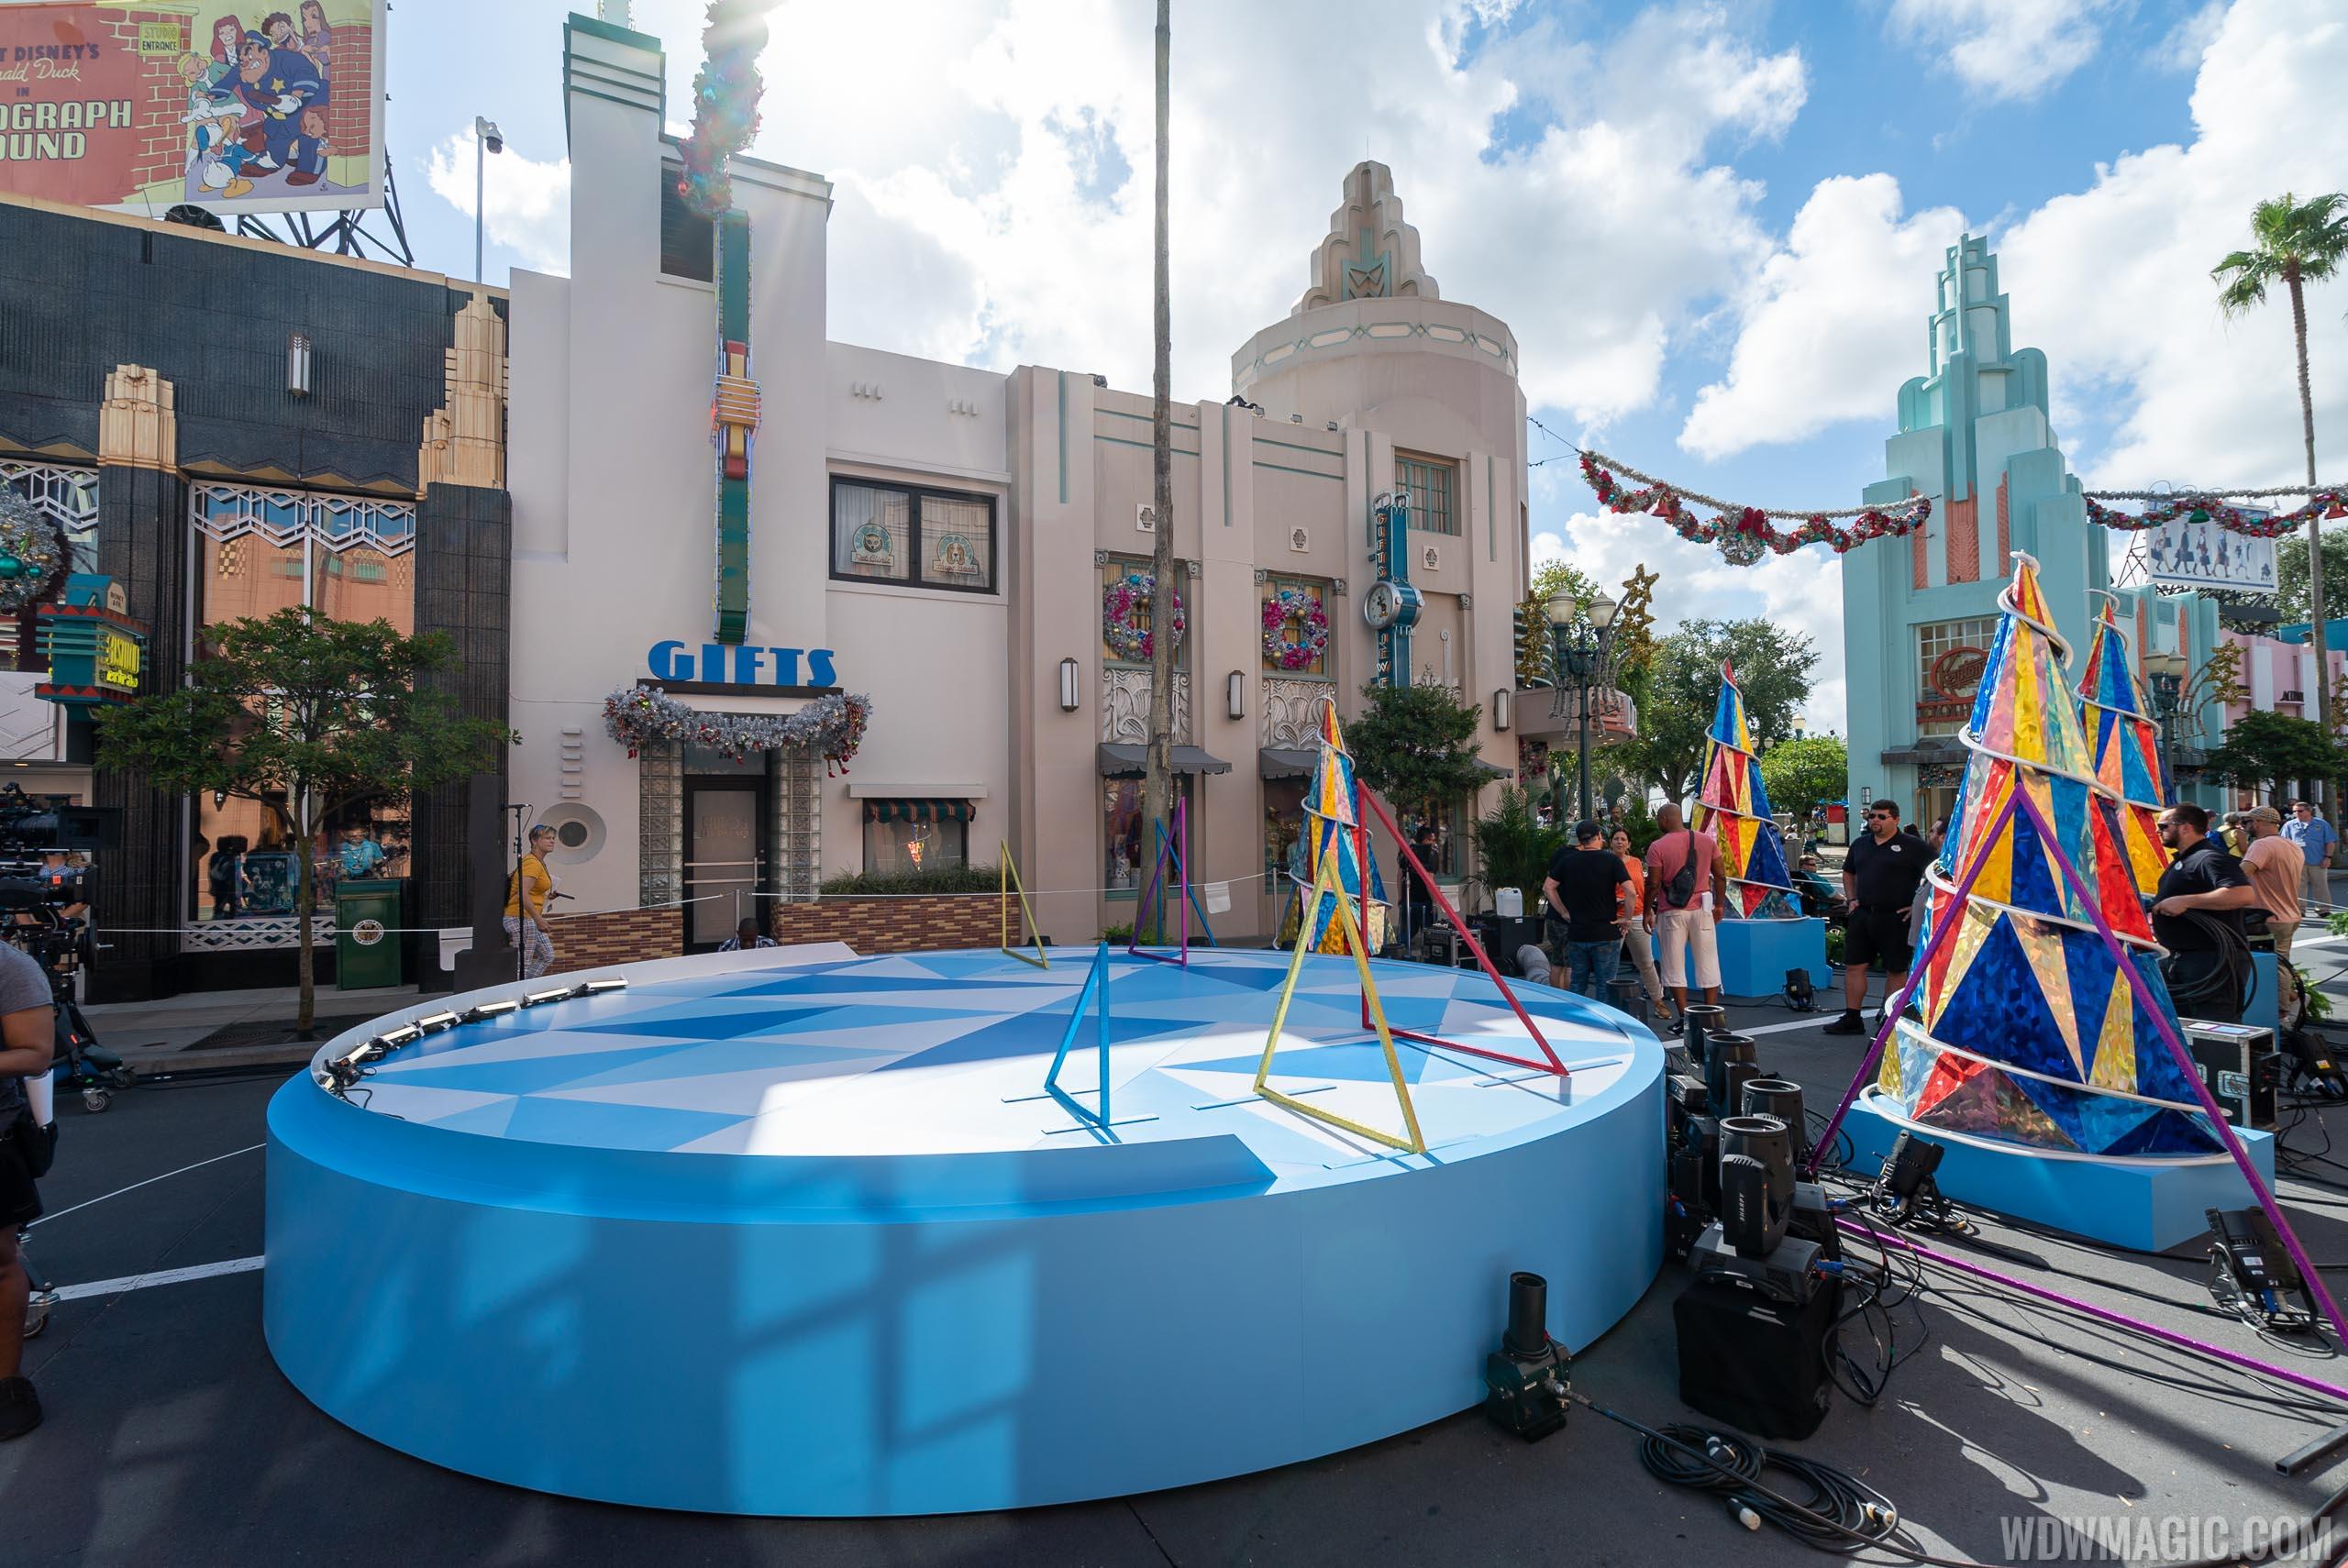 ABC Holiday Specials filming at Disney's Hollywood Studios 2019